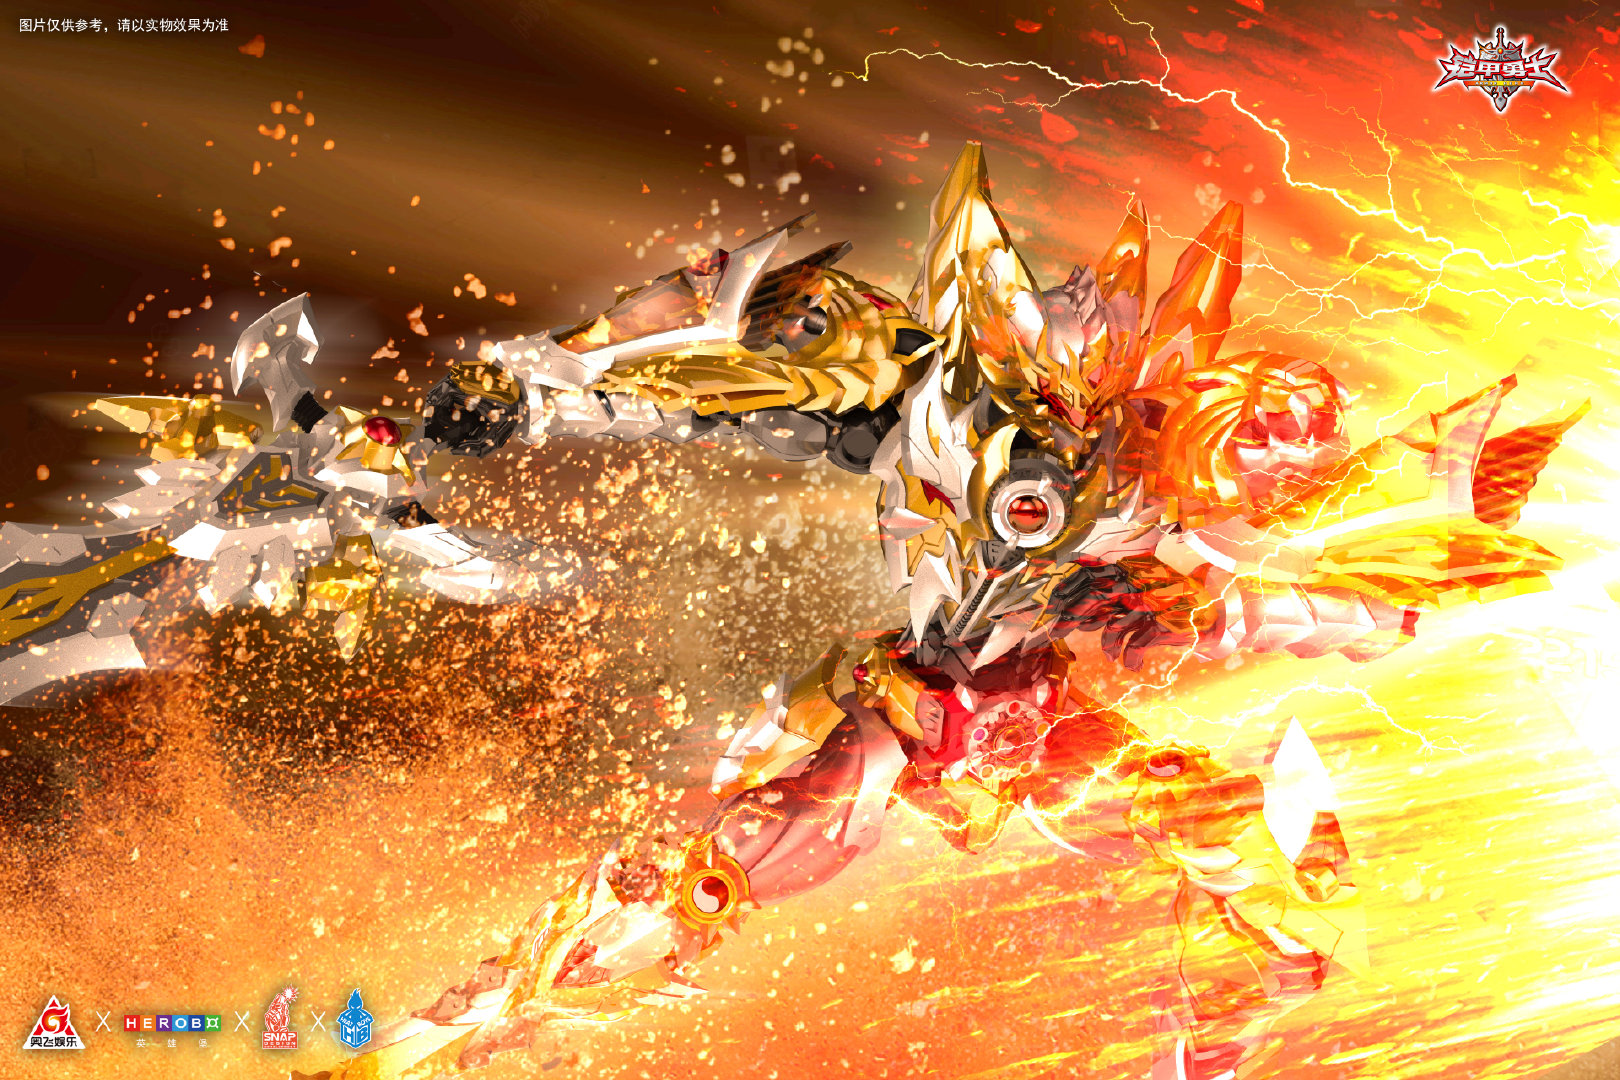 S535_Armor_hero_Emperor_031.jpg